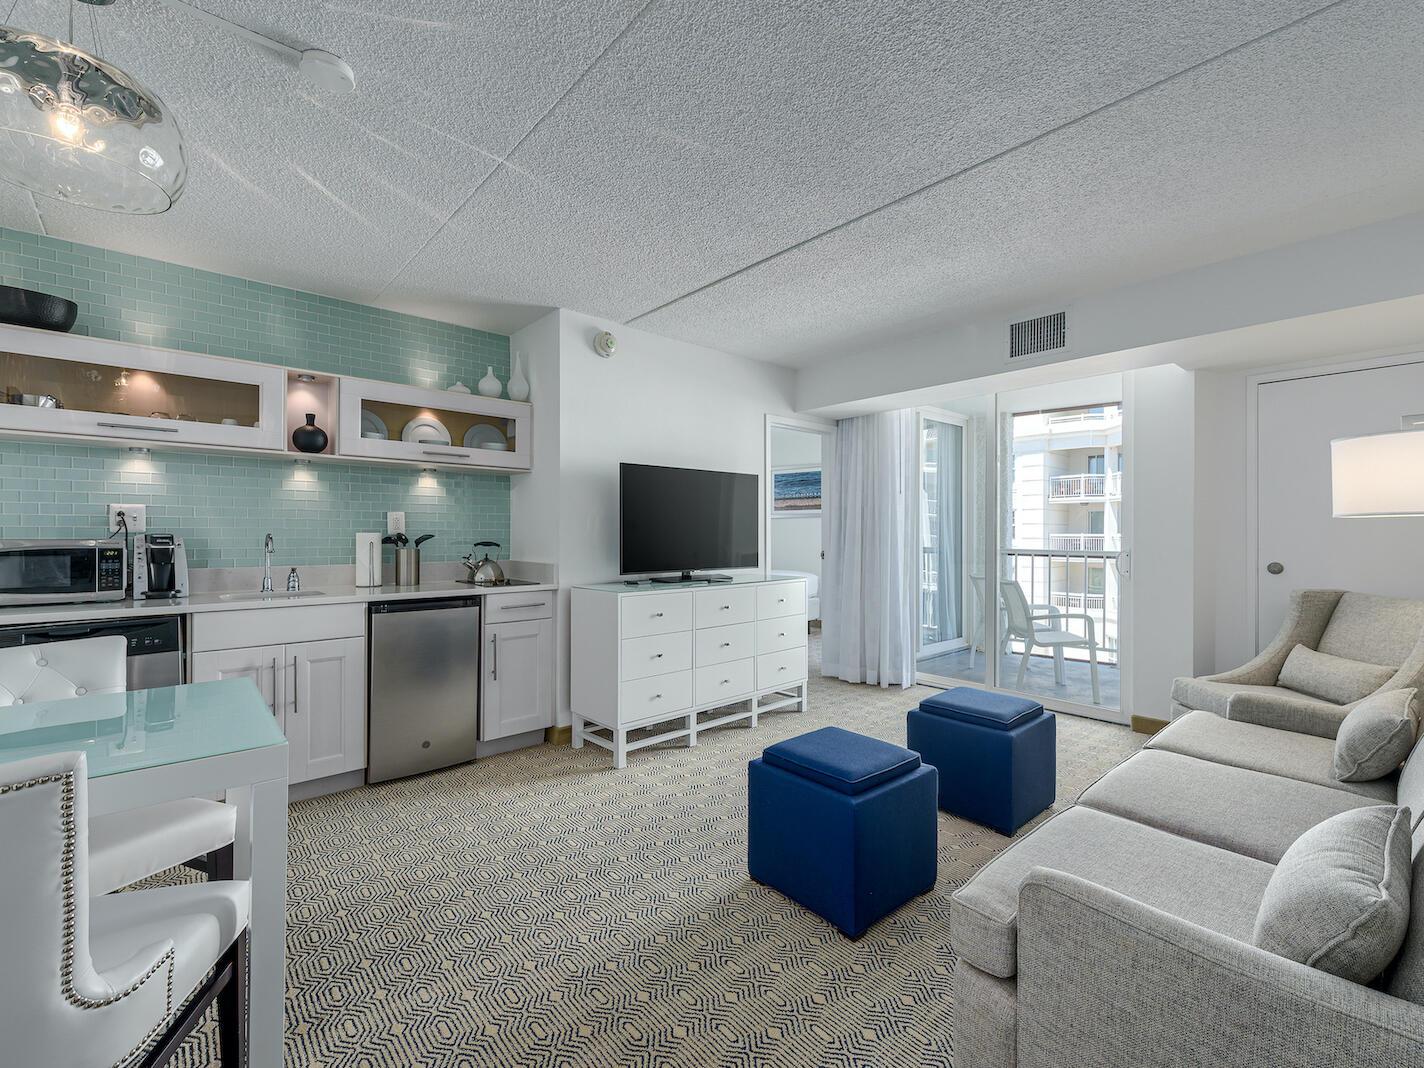 Premium Double Suite Living Room at Beachfront Hotel near Wildwood, NJ